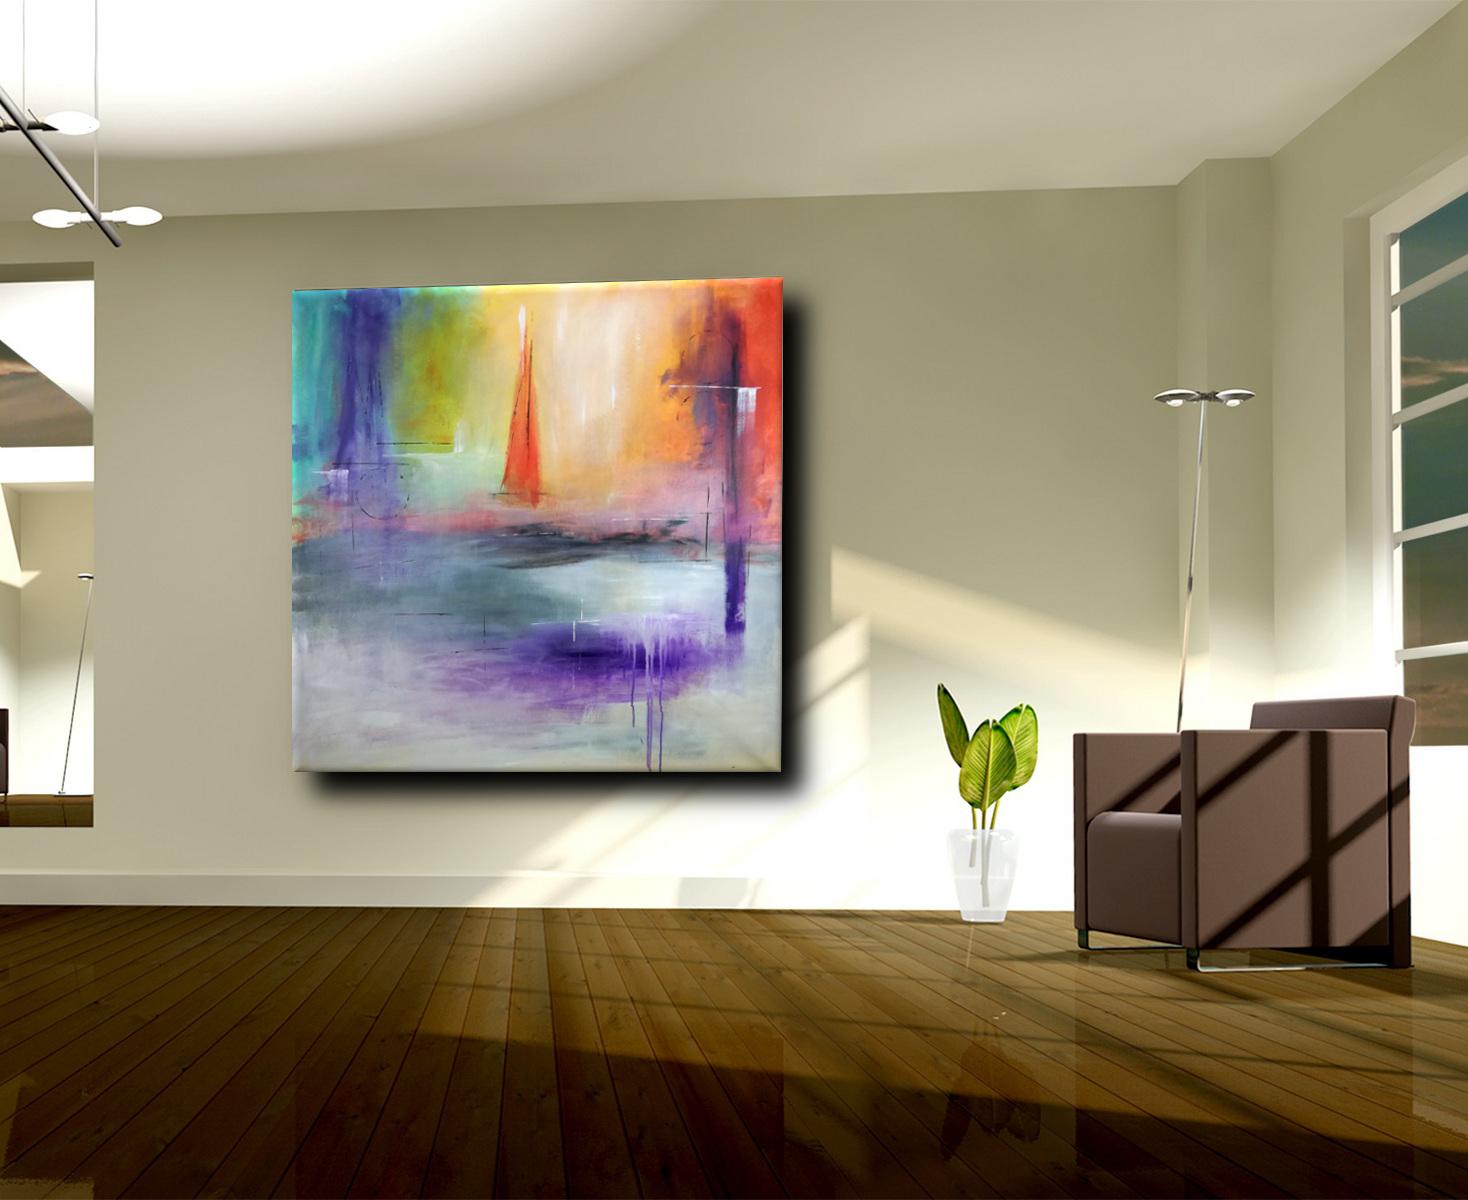 quadri moderni astratti su tela c071 - quadri astratti paesaggio rosso 135x135 cm